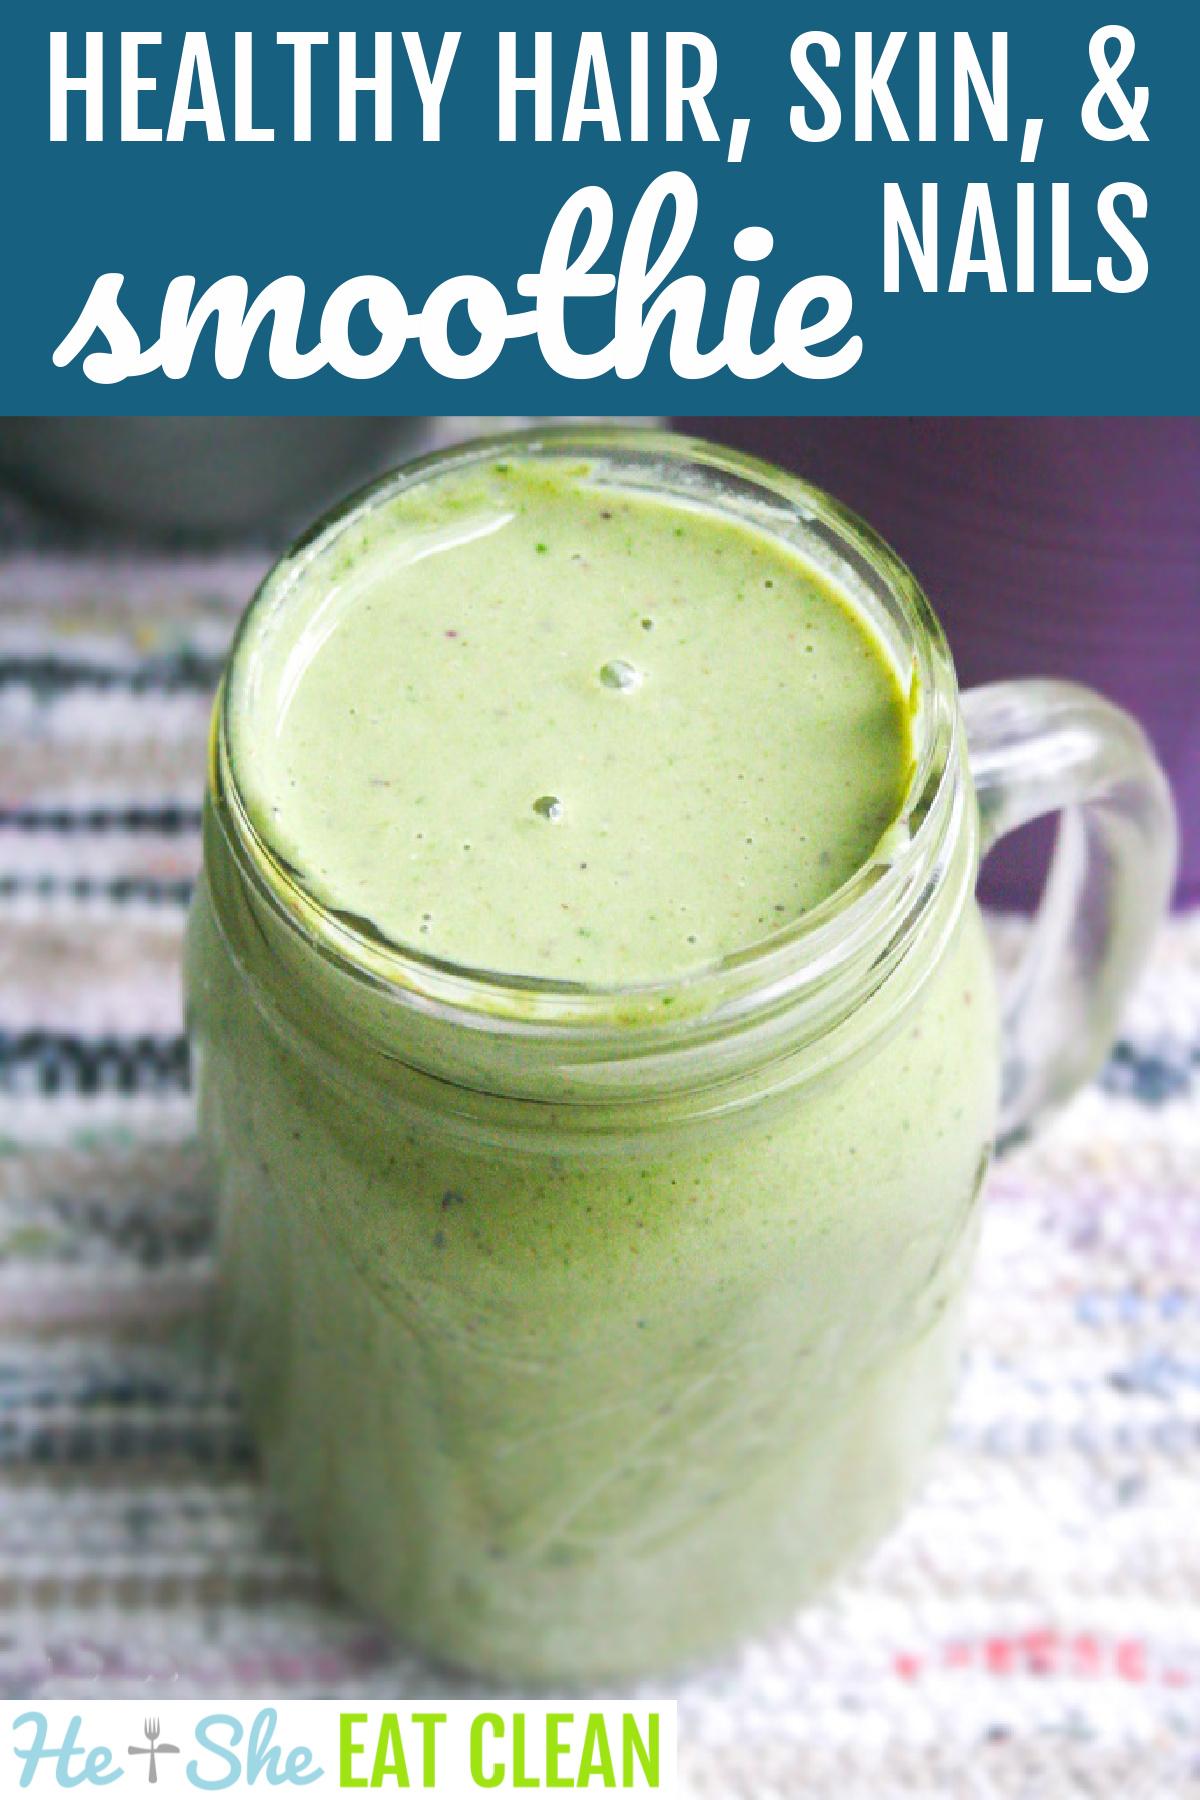 mason jar containing green smoothie